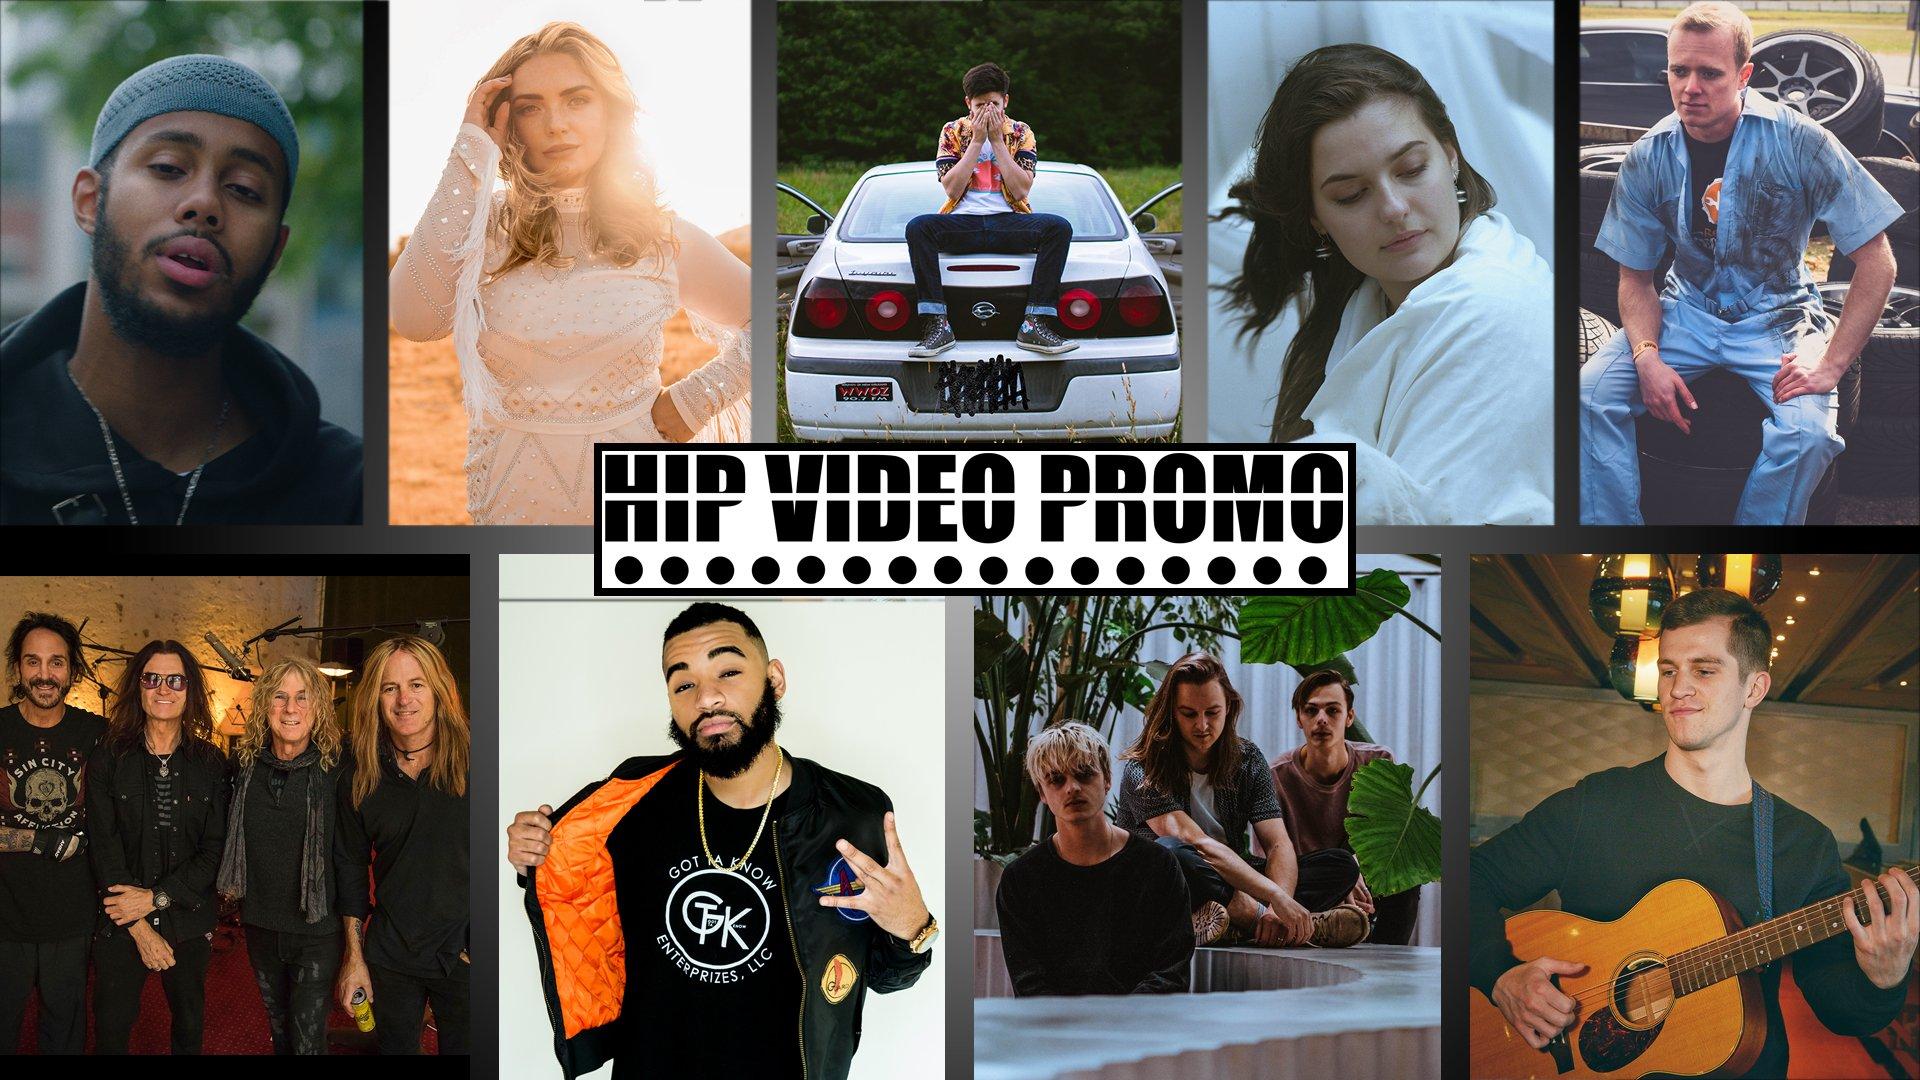 HIP Video Promo - Weekly Recap - 4/23/20